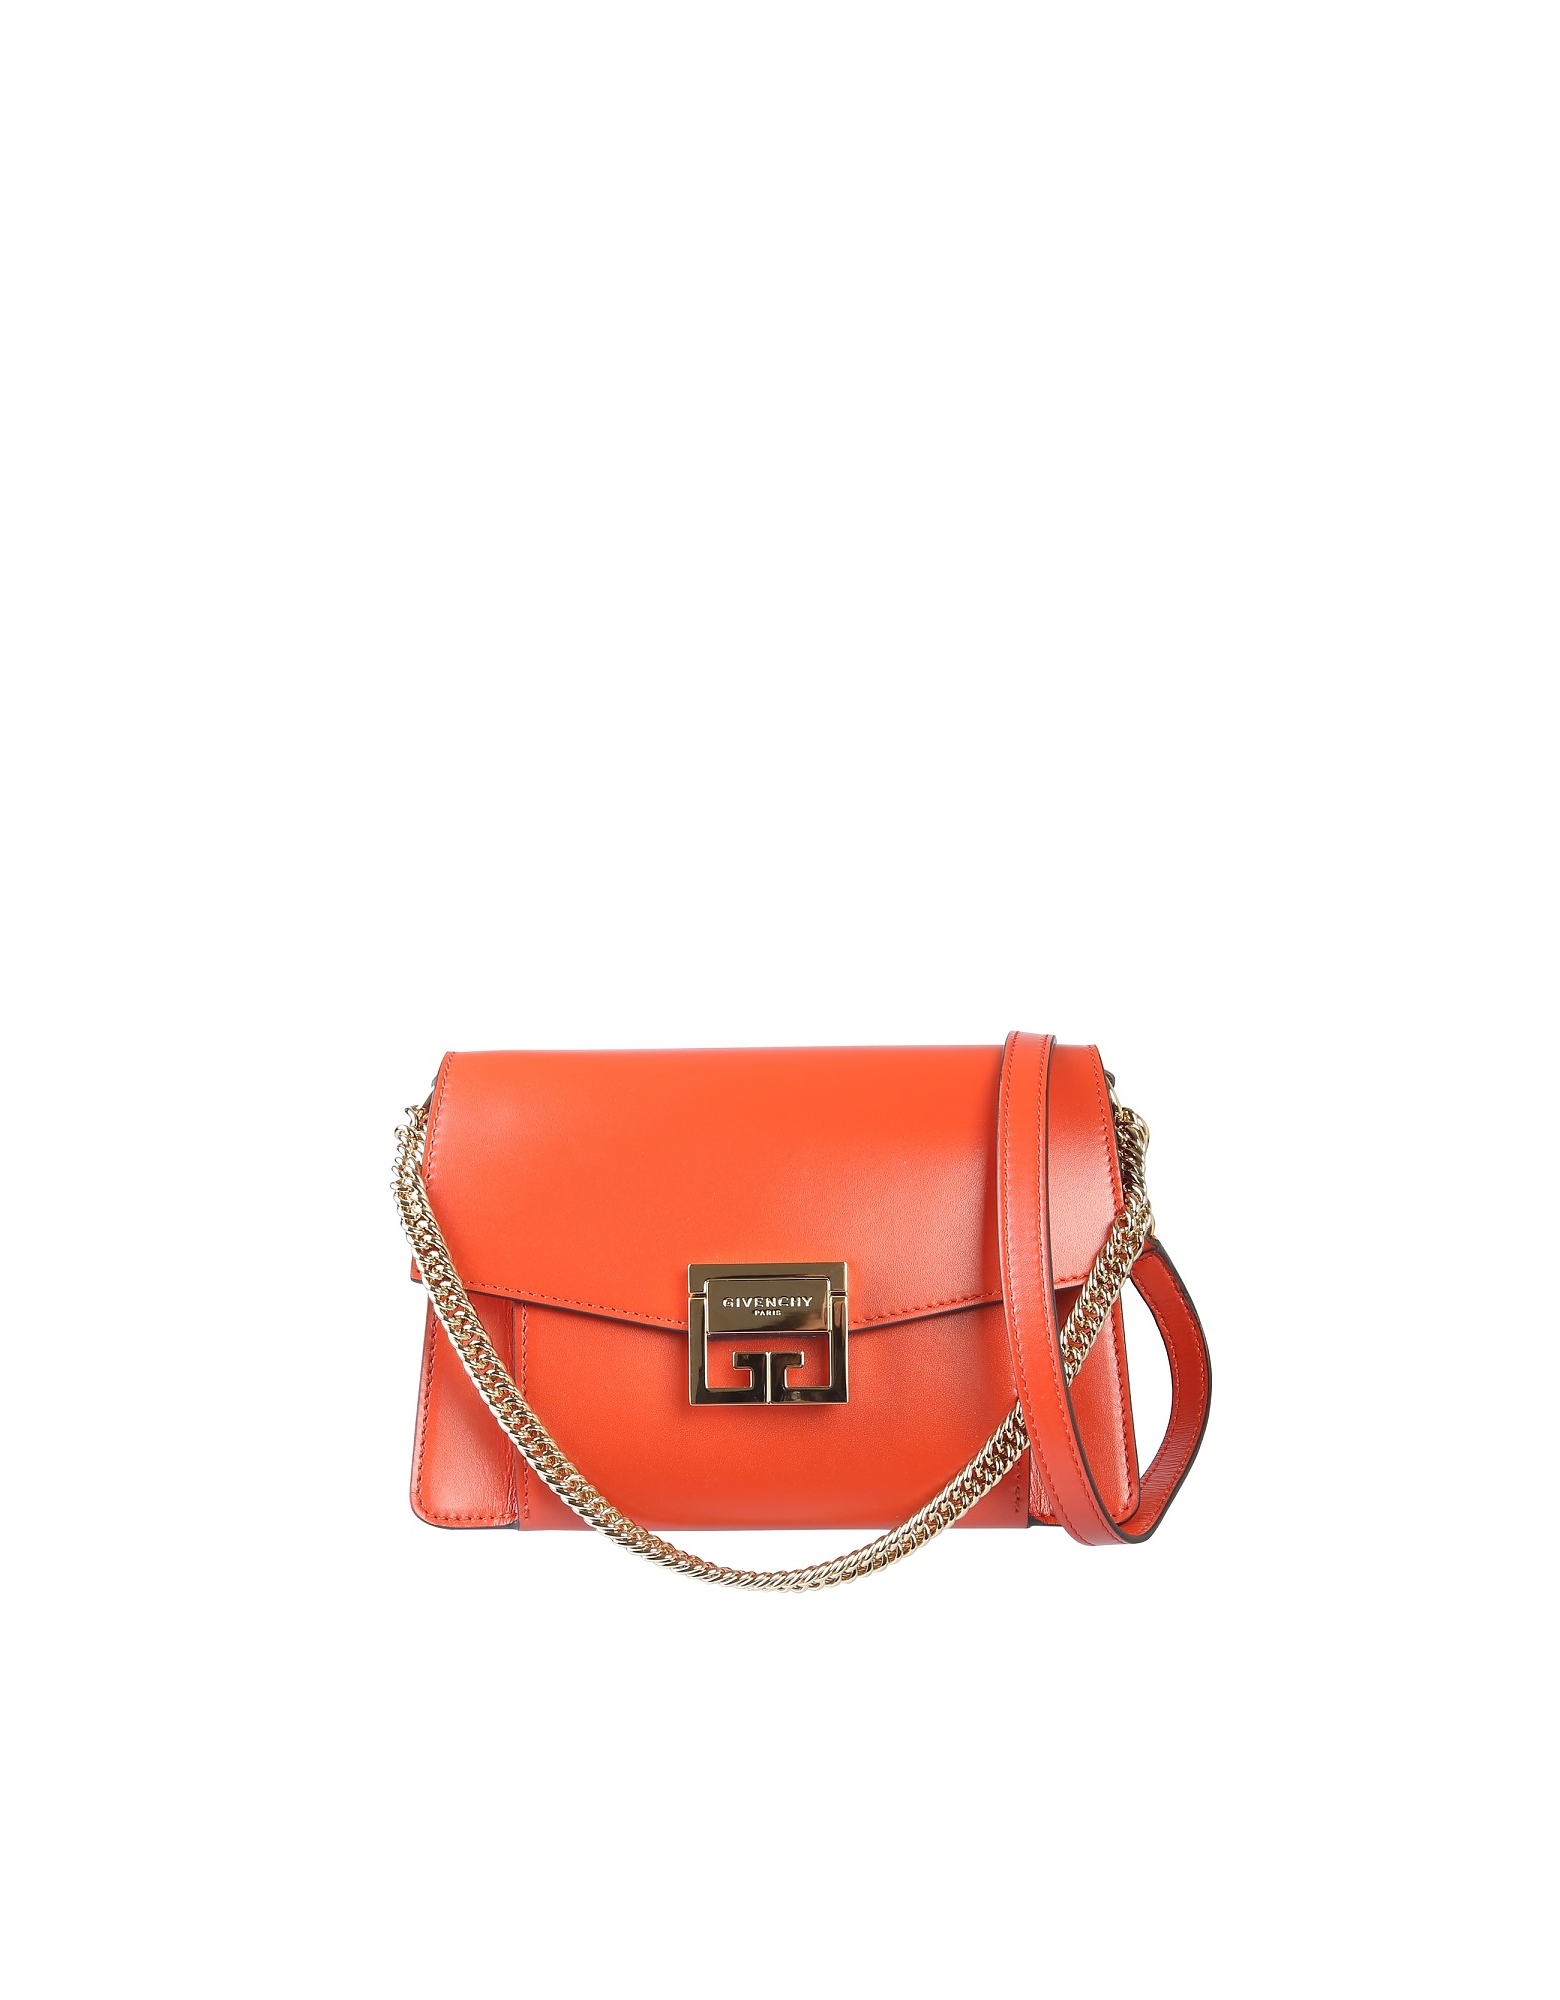 Givenchy Designer Handbags, Small Gv3 Bag